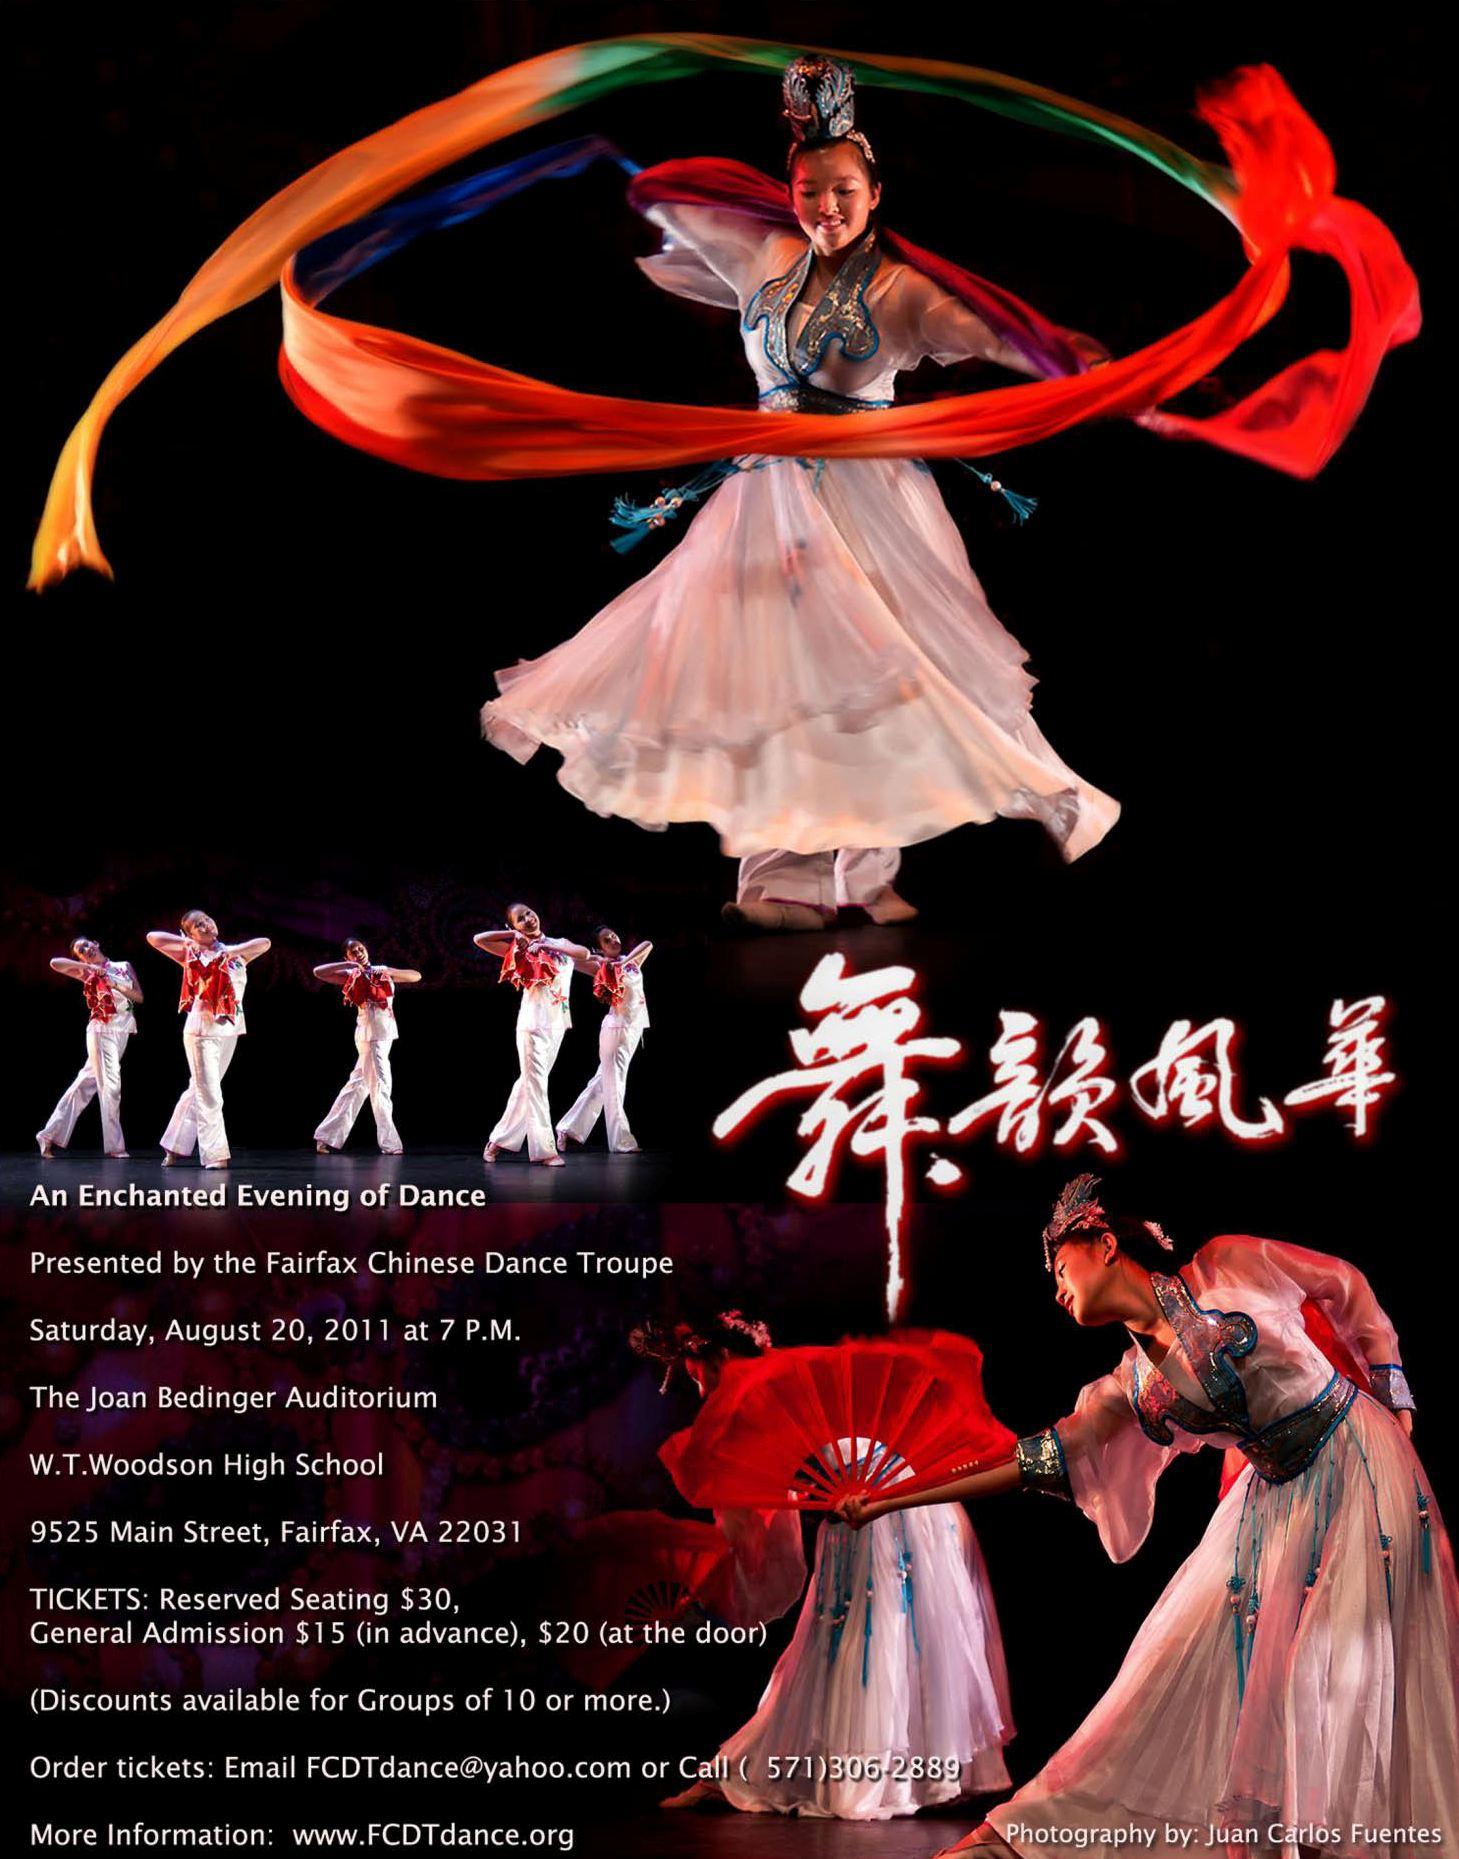 An Enchanted Evening of Dance